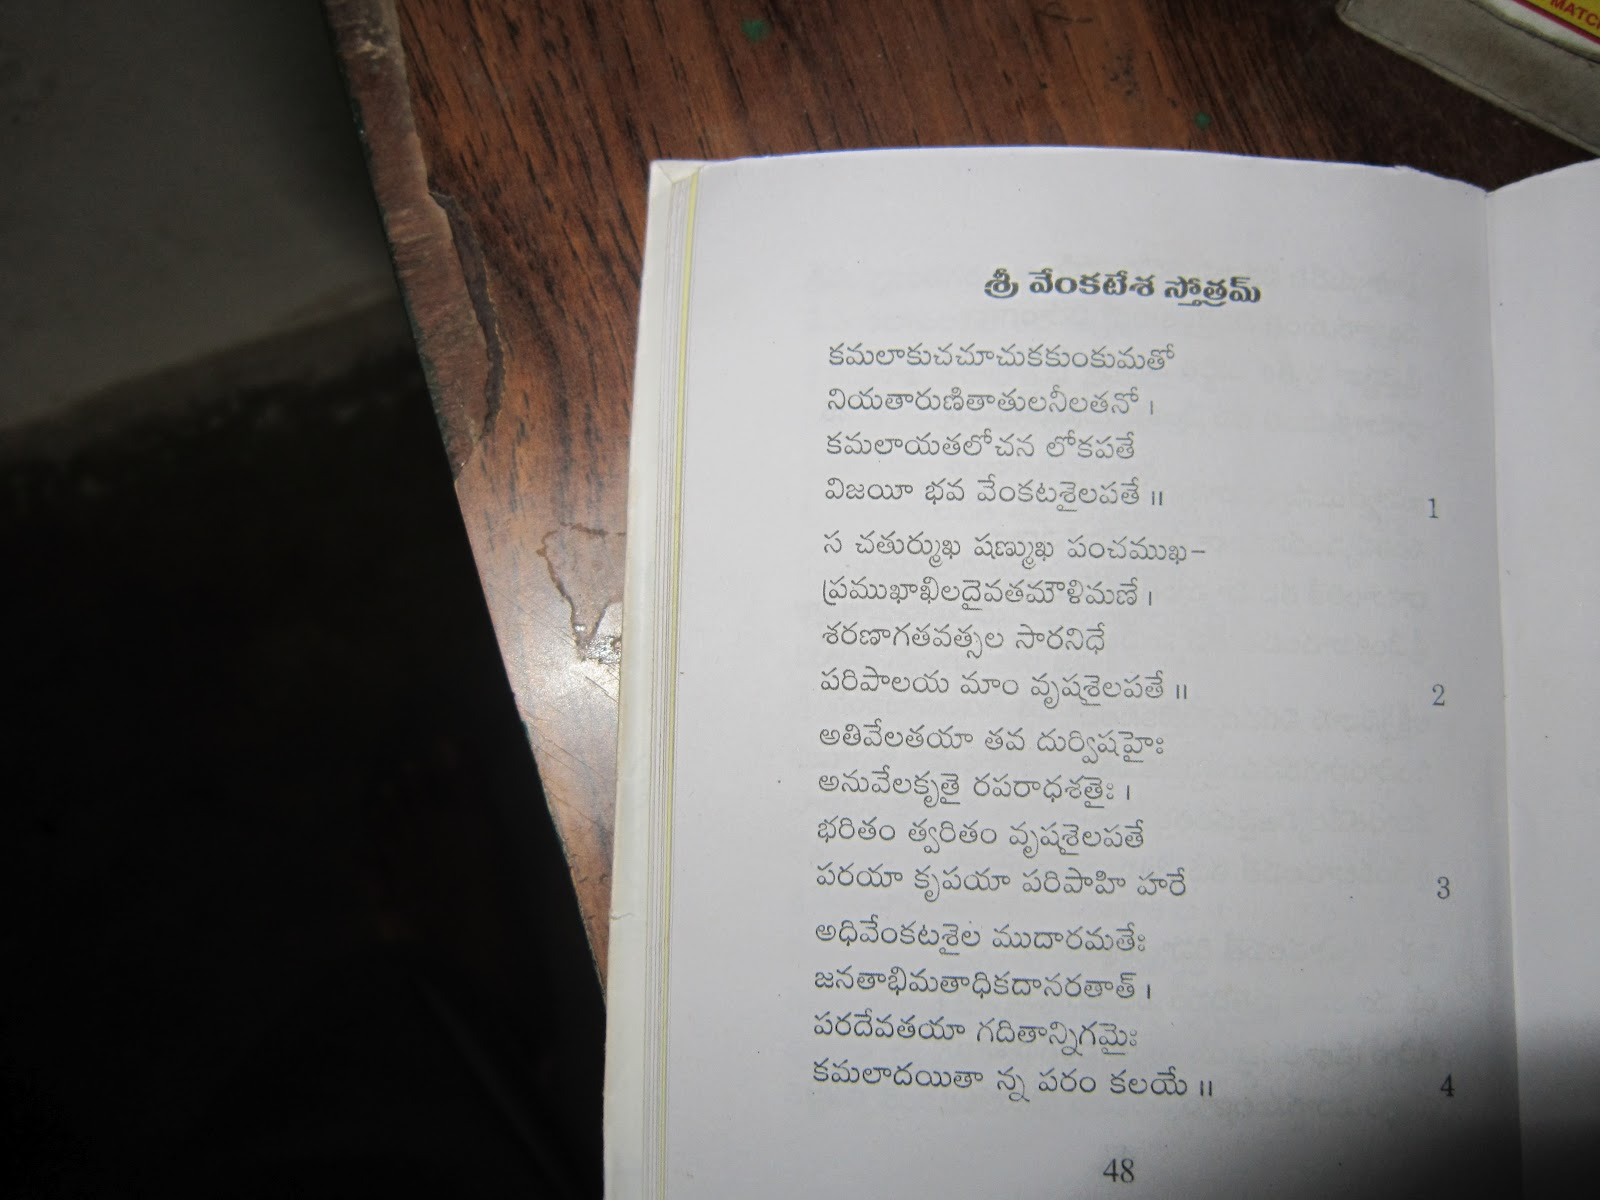 venkateswara stotram lyrics